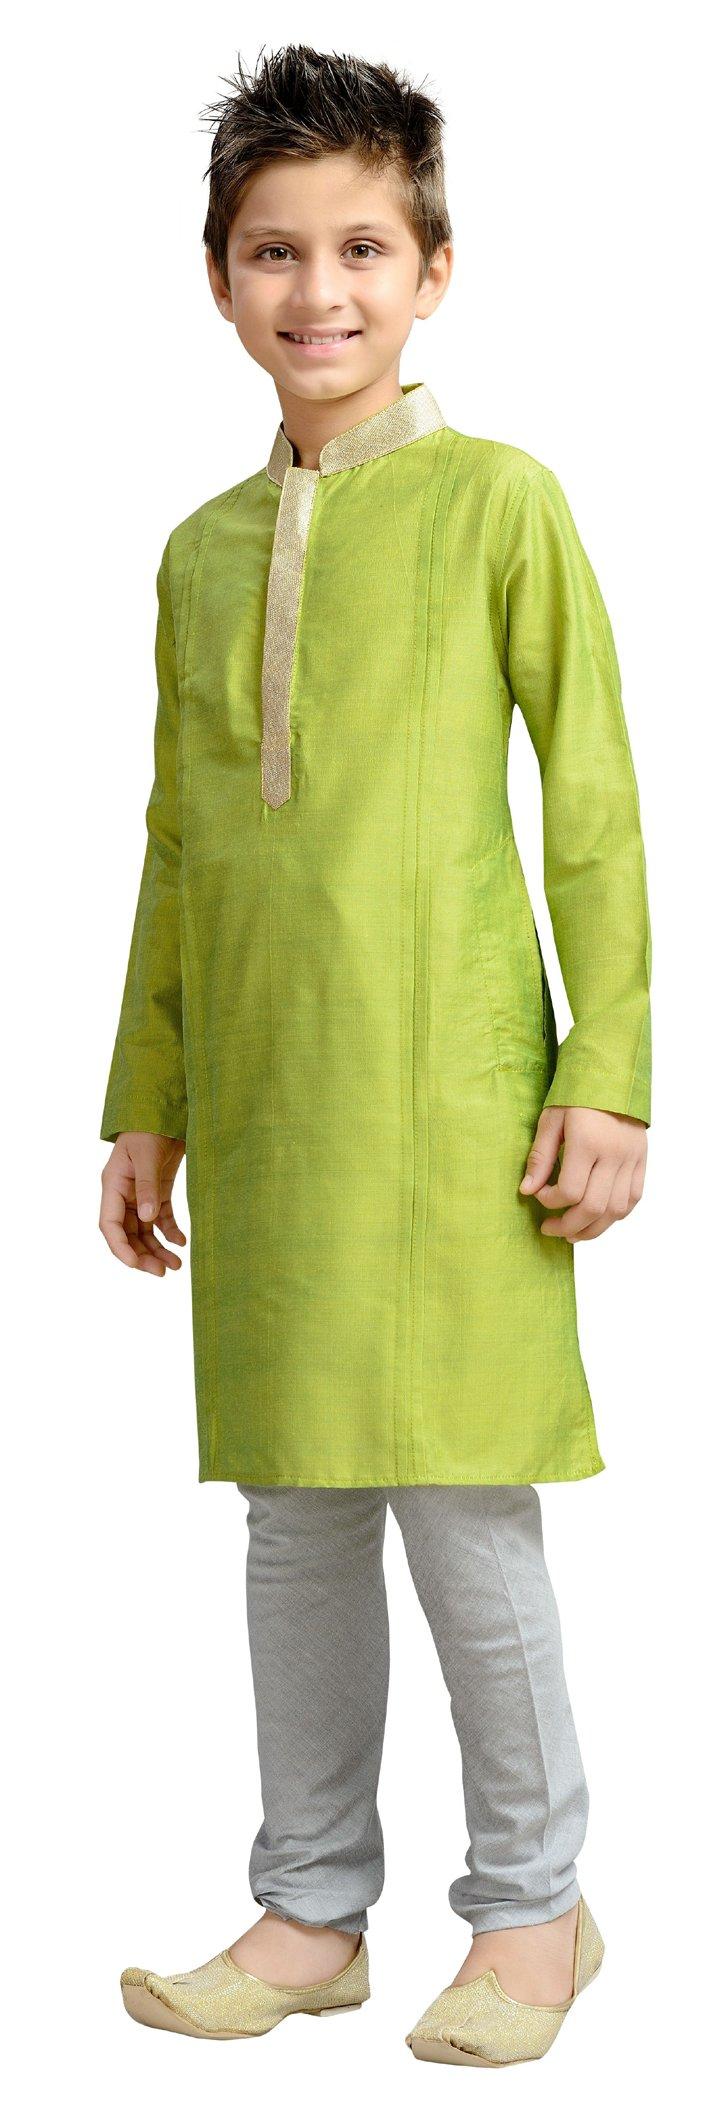 Cellora Churidar Kurta Pajama for 1-14 Years Kids Dupion Silk Party Wear Ethnic Dress by Cellora (Image #3)